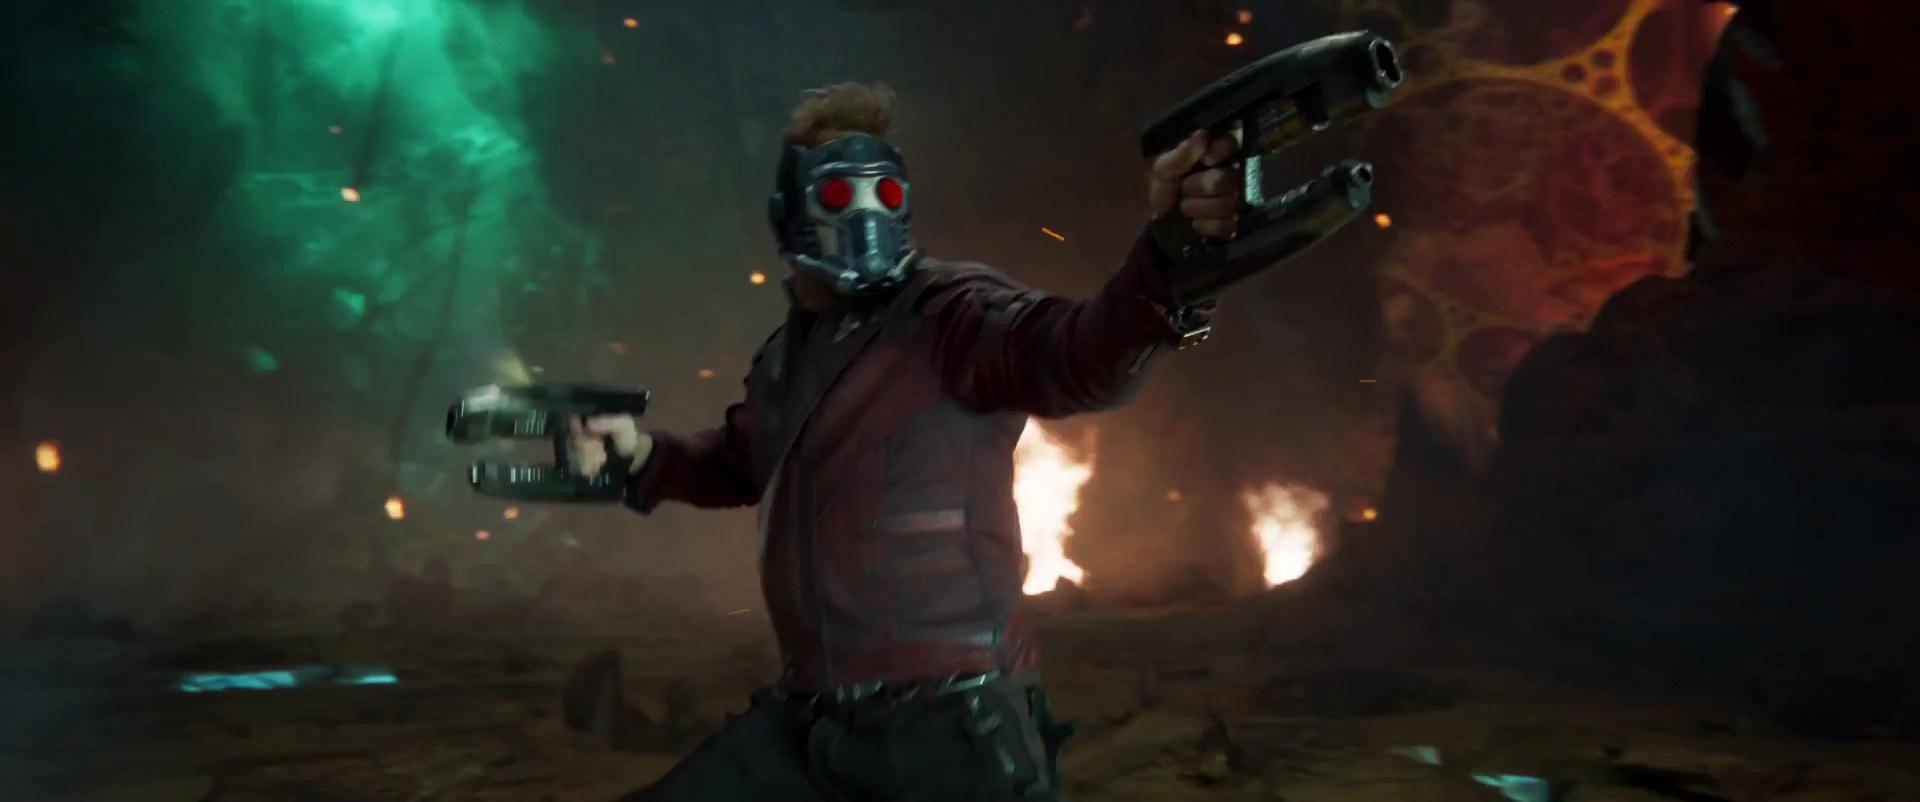 Guardians of the Galaxy Vol. 2 Trailer | Sci-Fi Movie Trailer